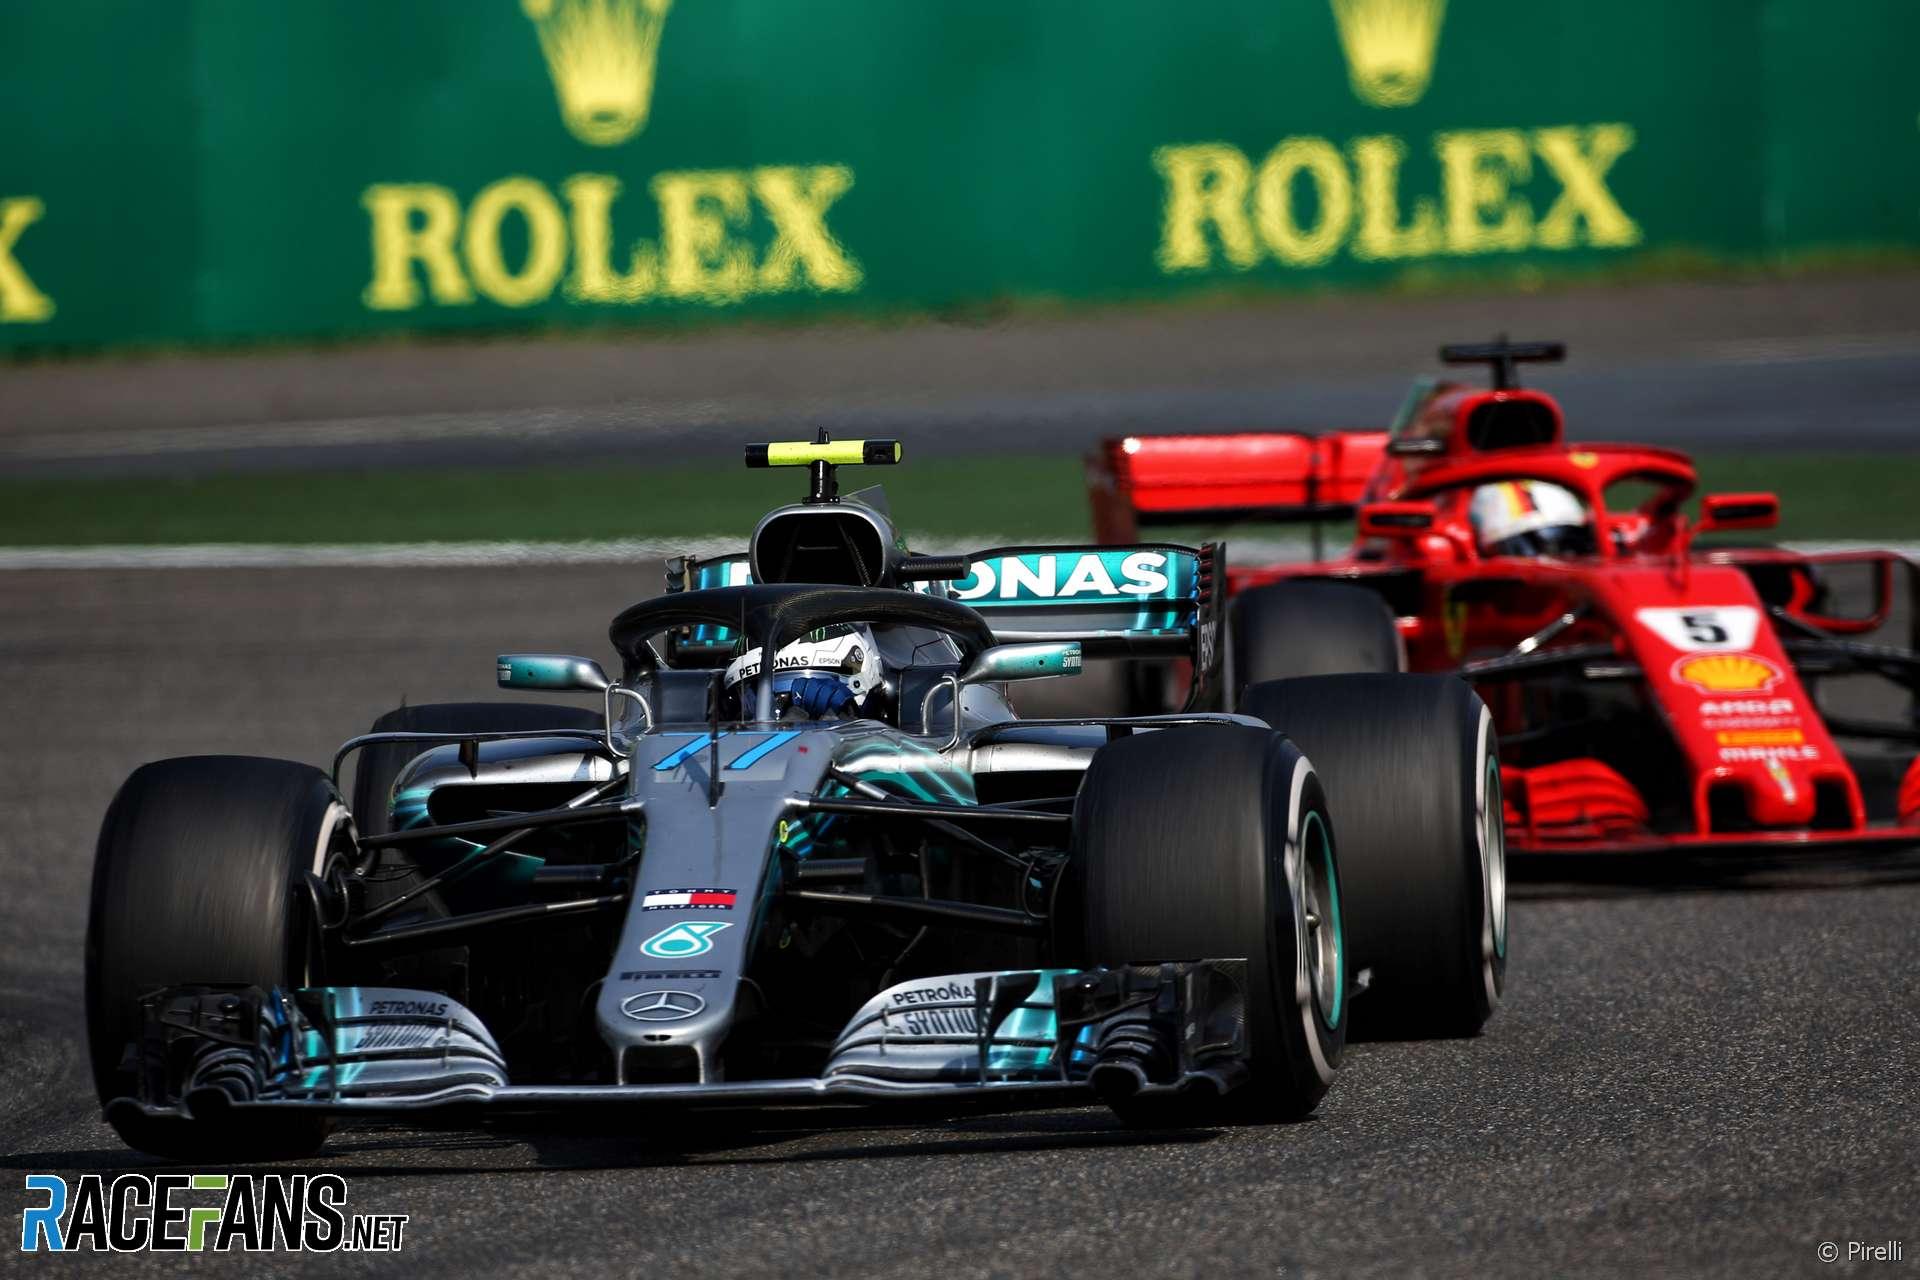 Valtteri Bottas, Mercedes, Shanghai International Circuit, 2018